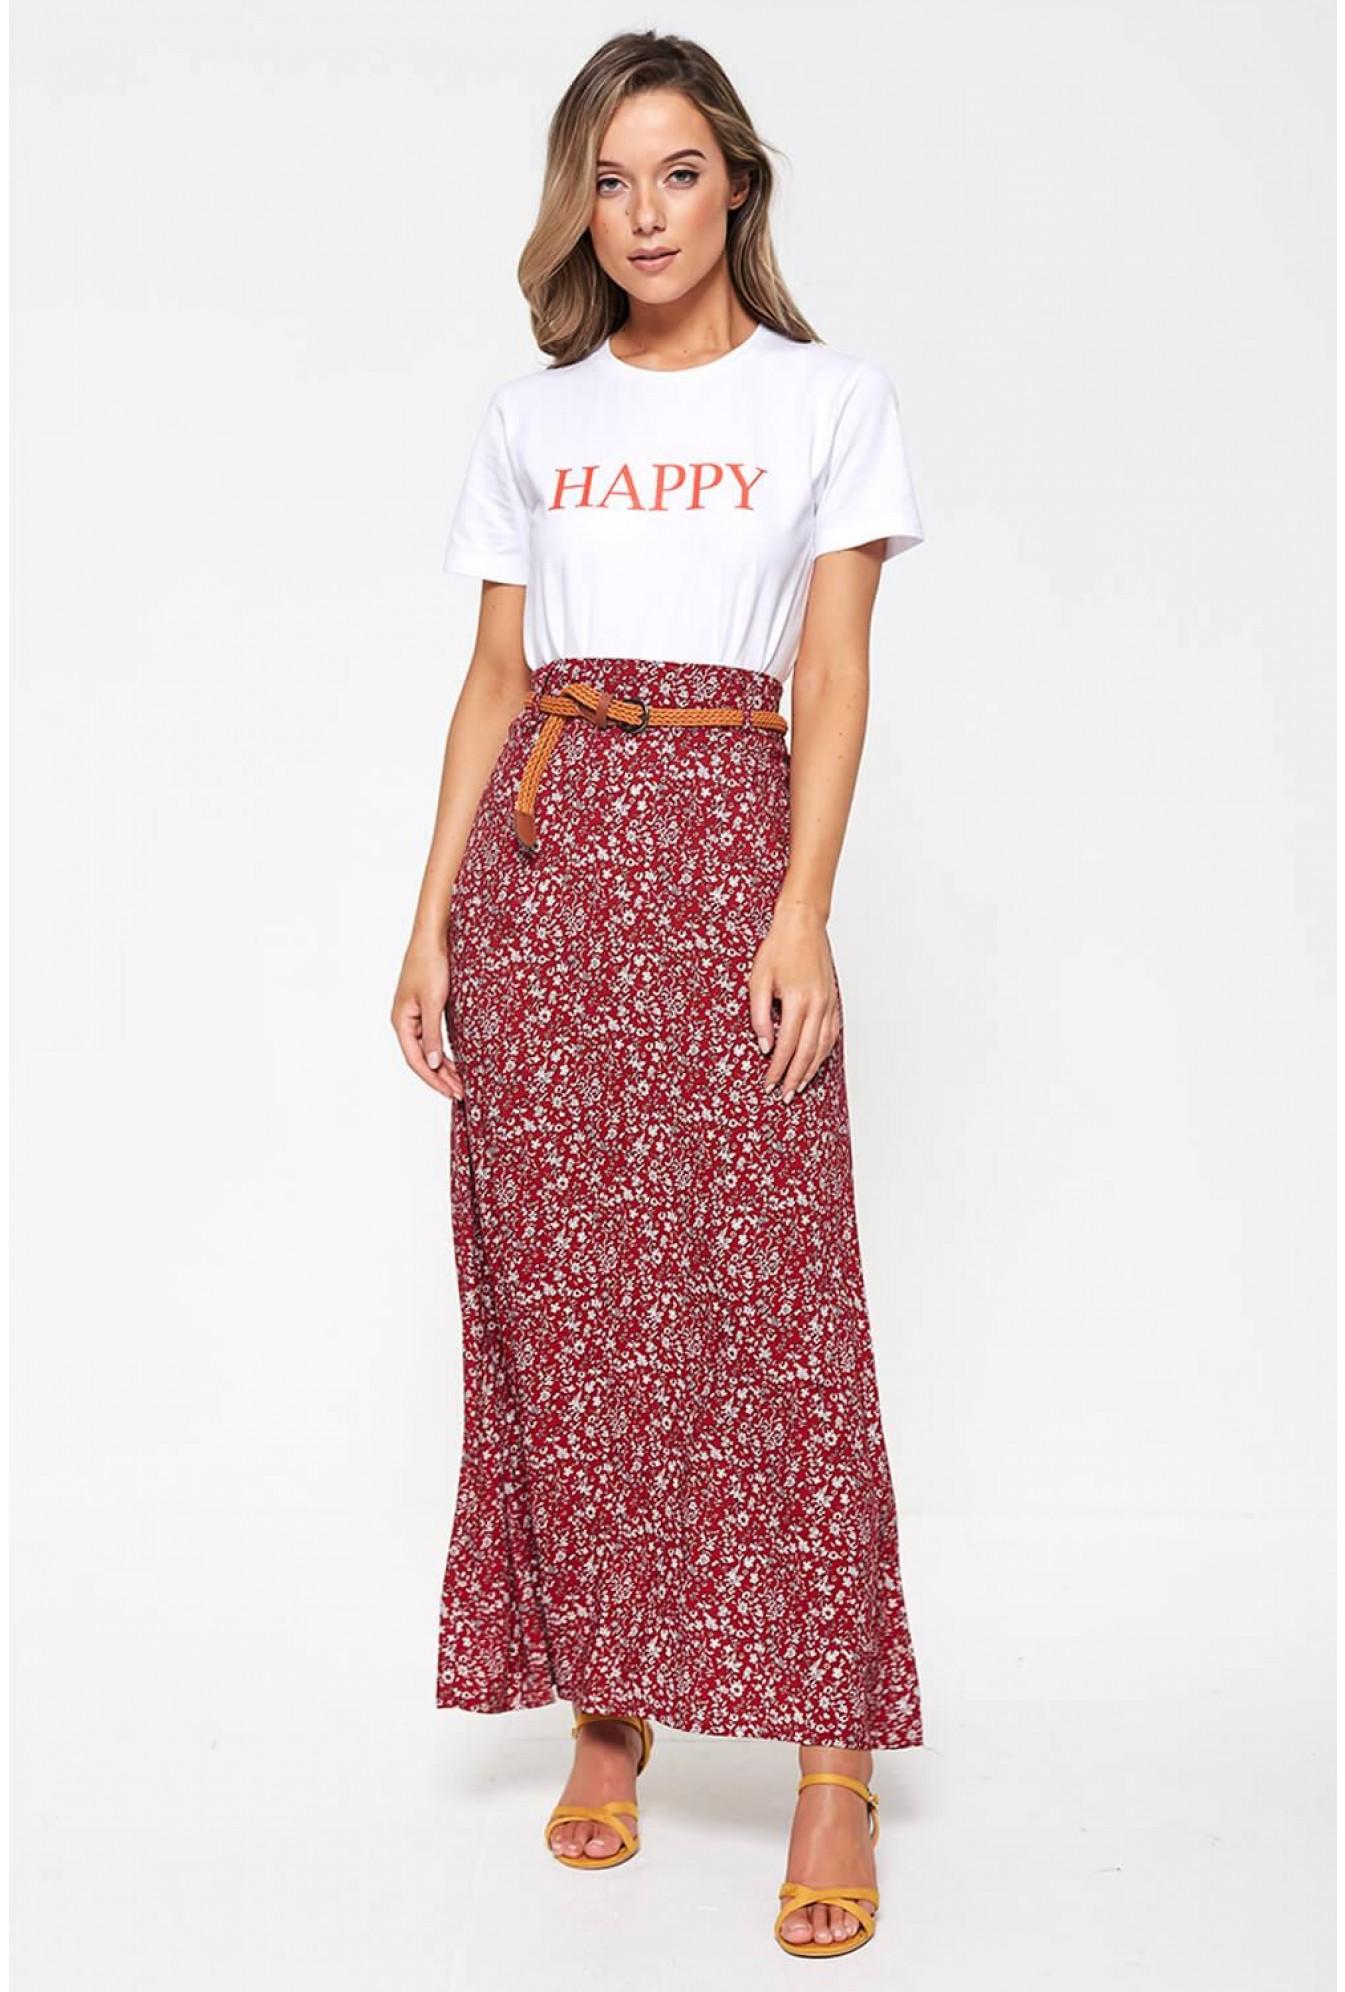 2bce43a3845f Floral Print Maxi Skirts